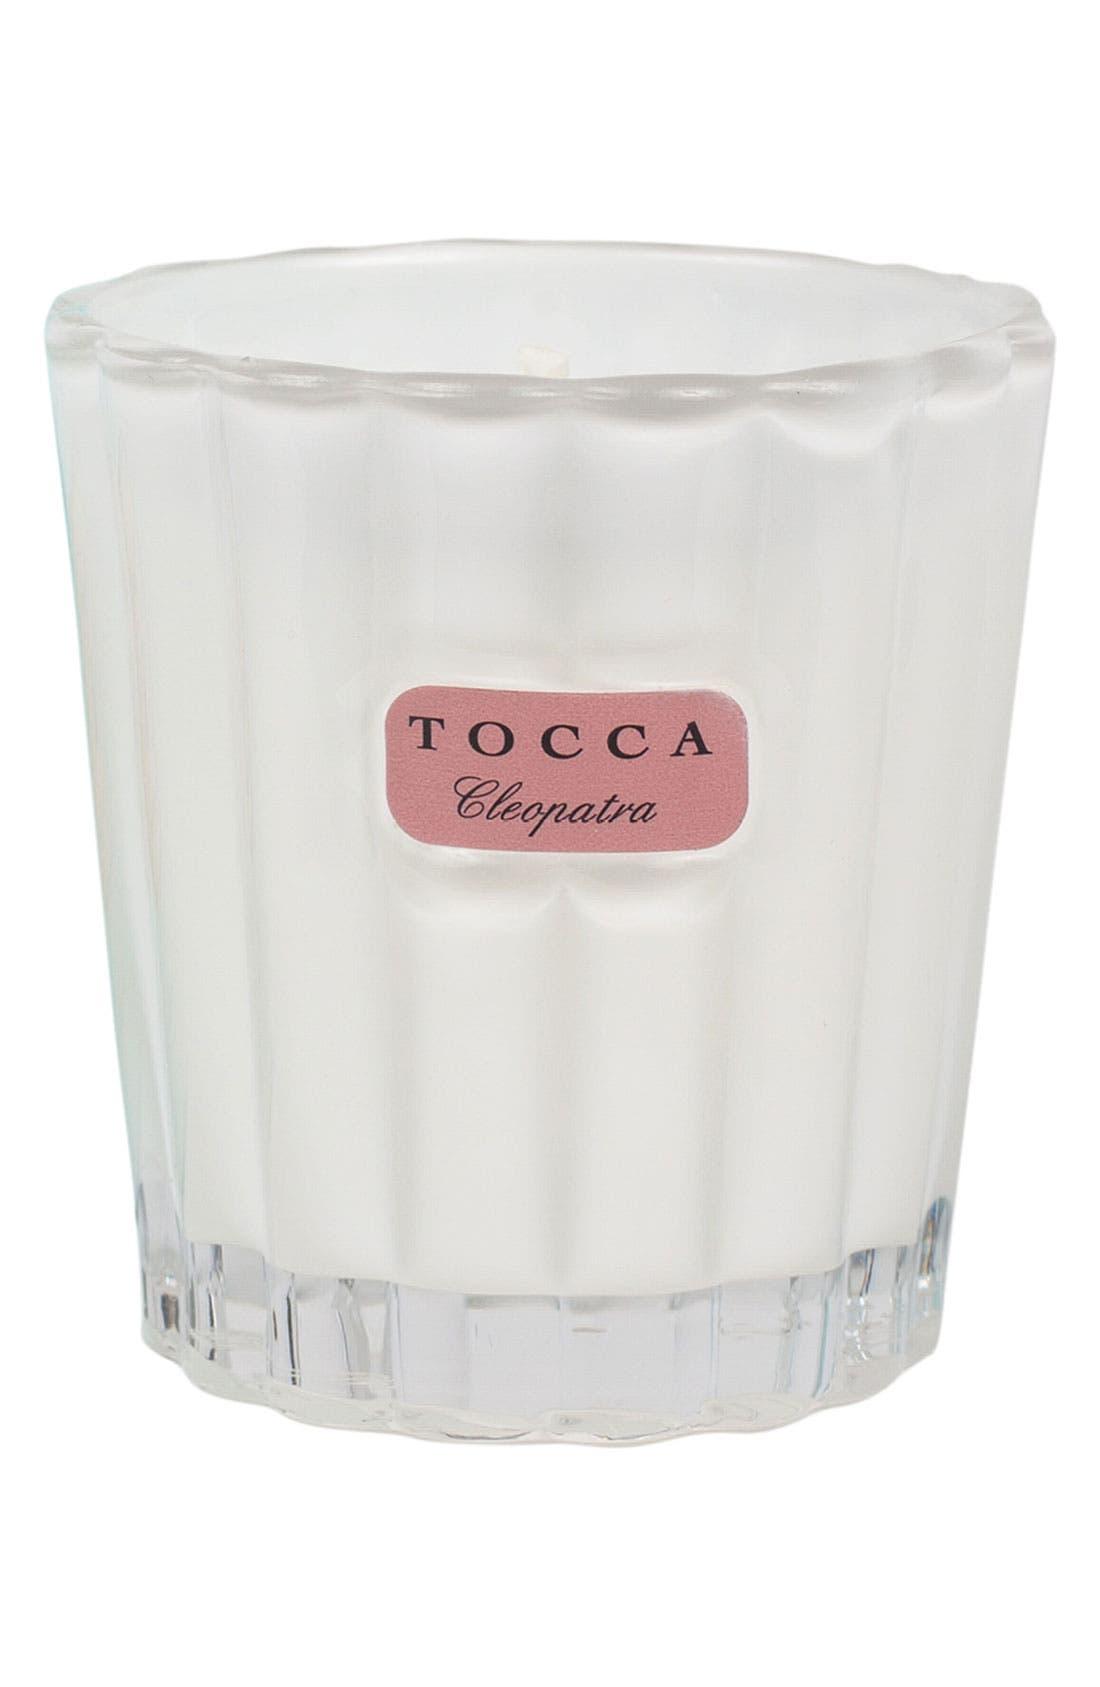 TOCCA 'Cleopatra' Candelina